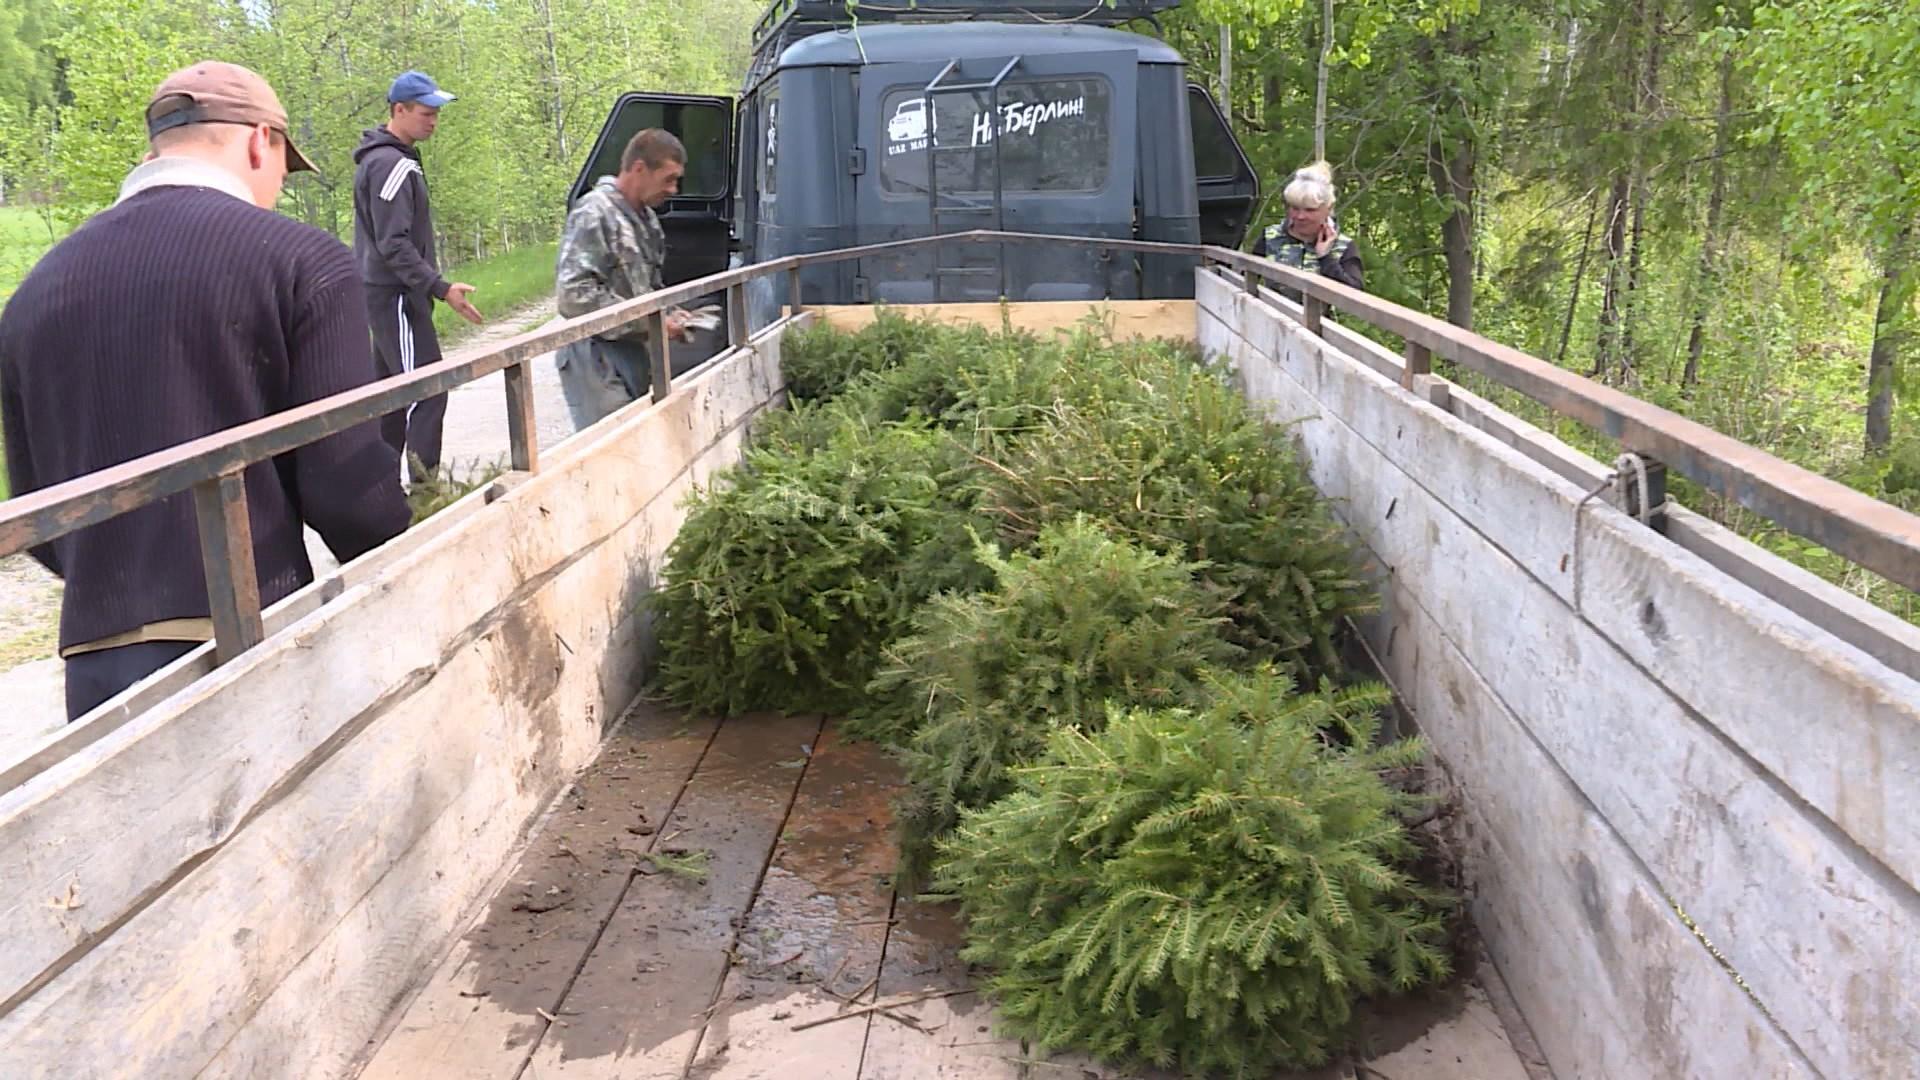 Костромской лес засаживают ярославскими ёлками